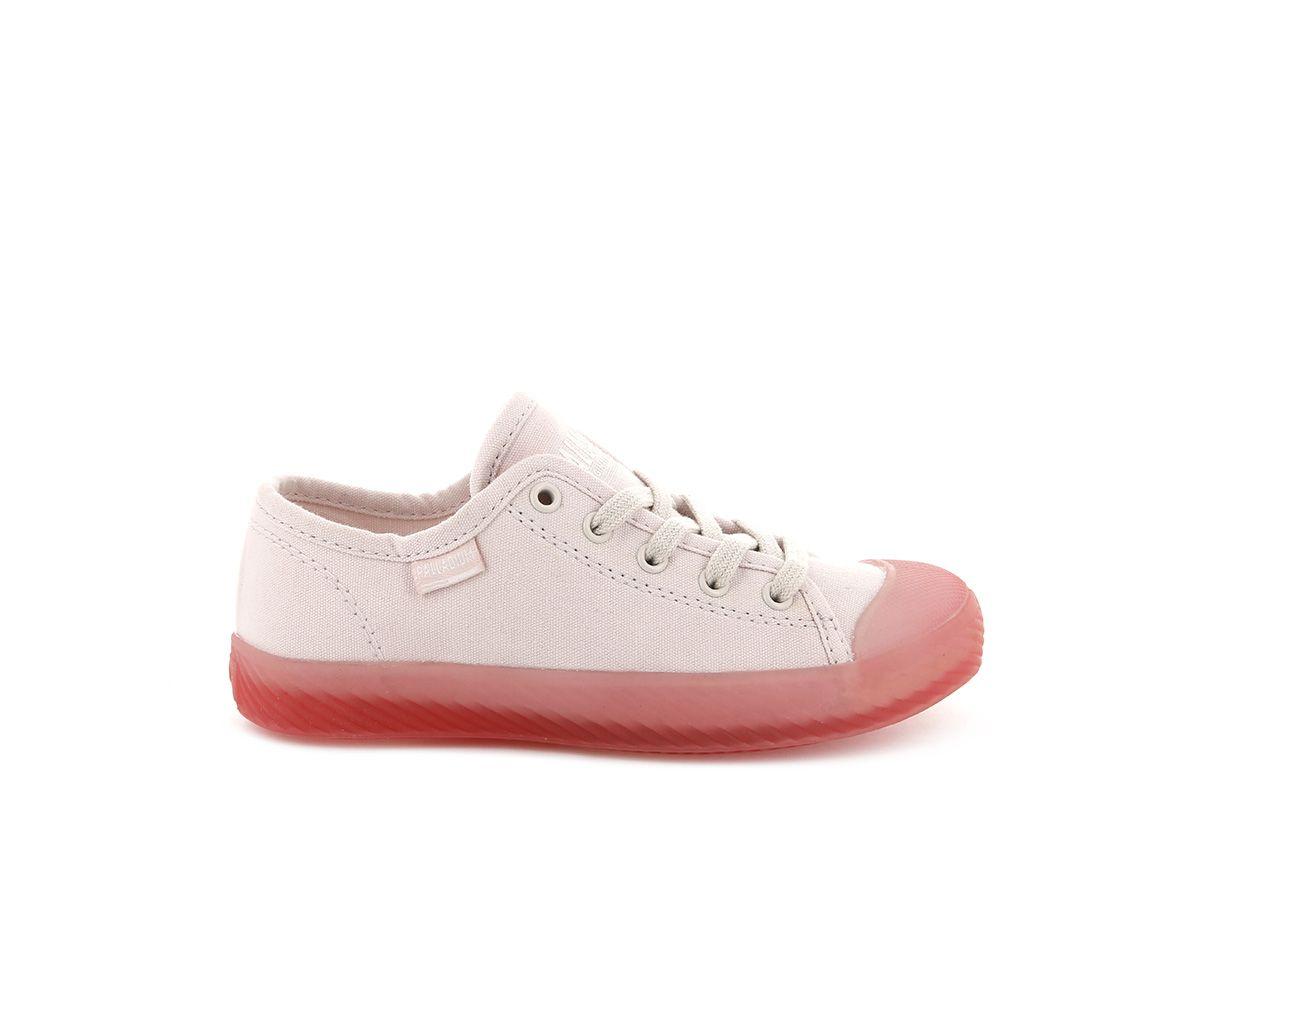 Palladium Pallaphoenix Lace Candy (Childrens) in Peach Blush